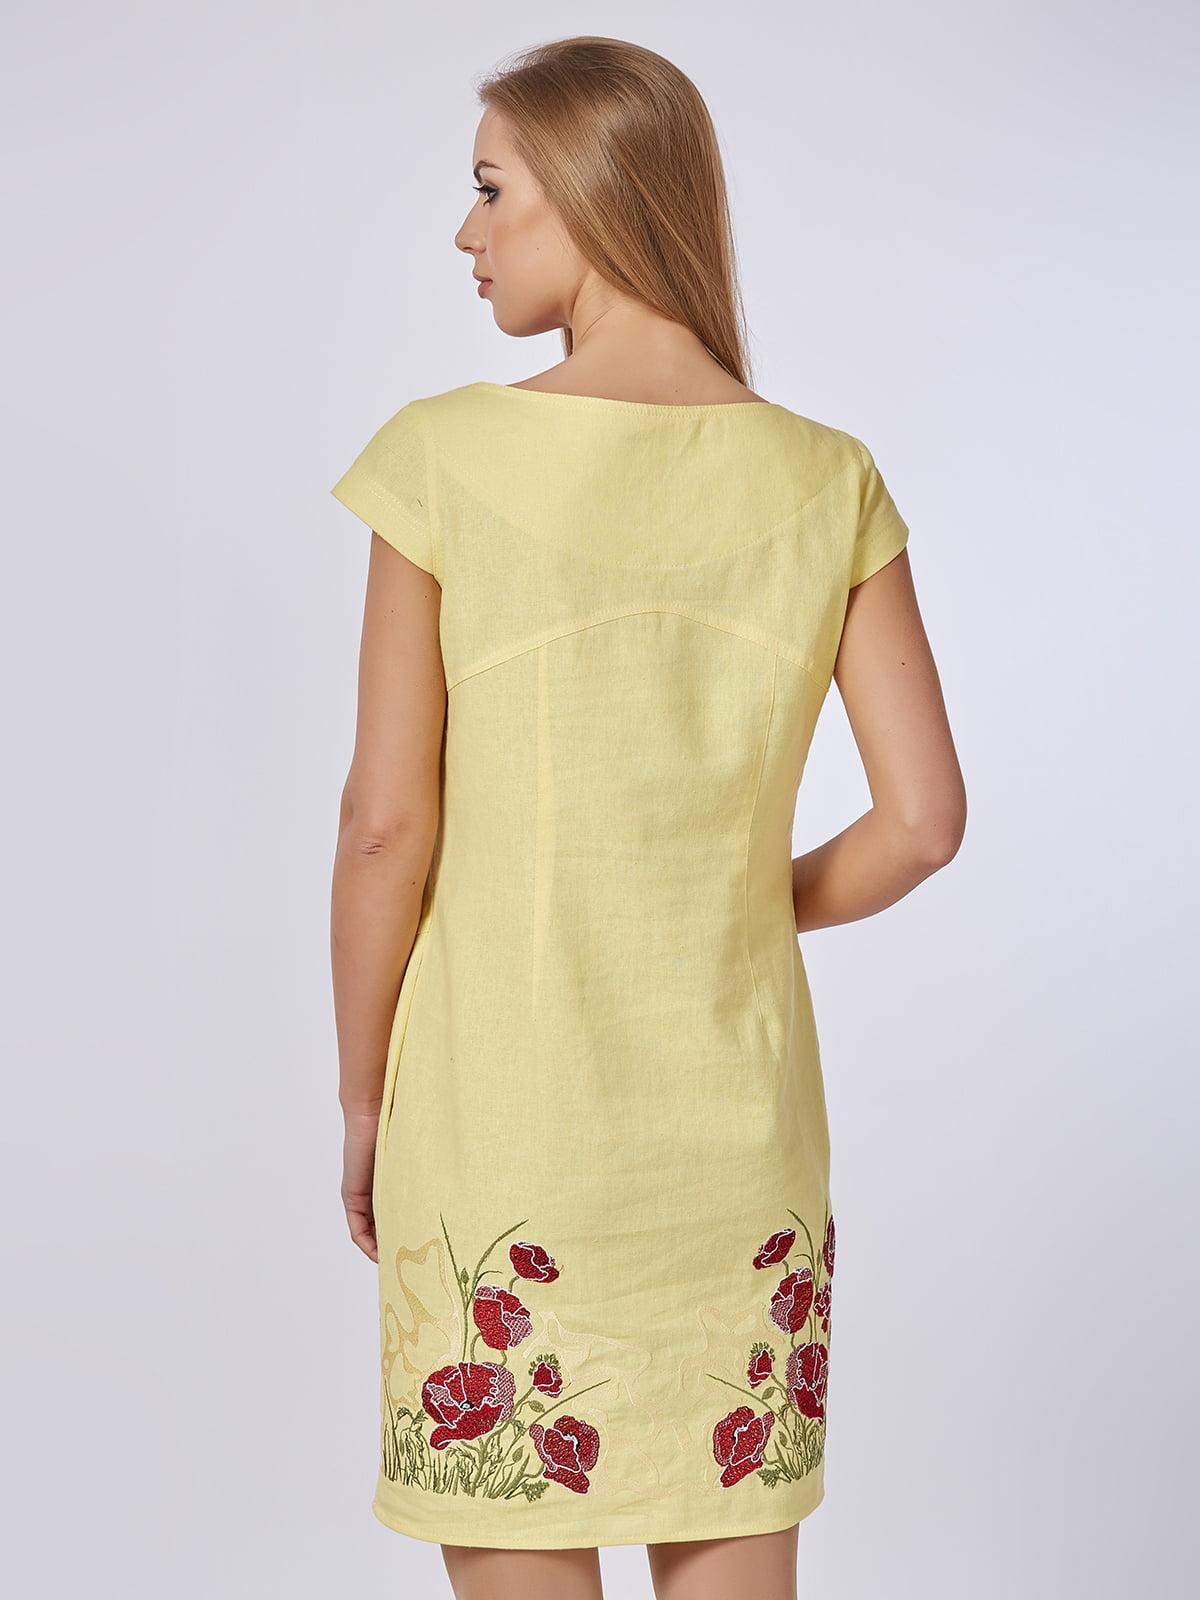 Сукня жовта | 4327652 | фото 2